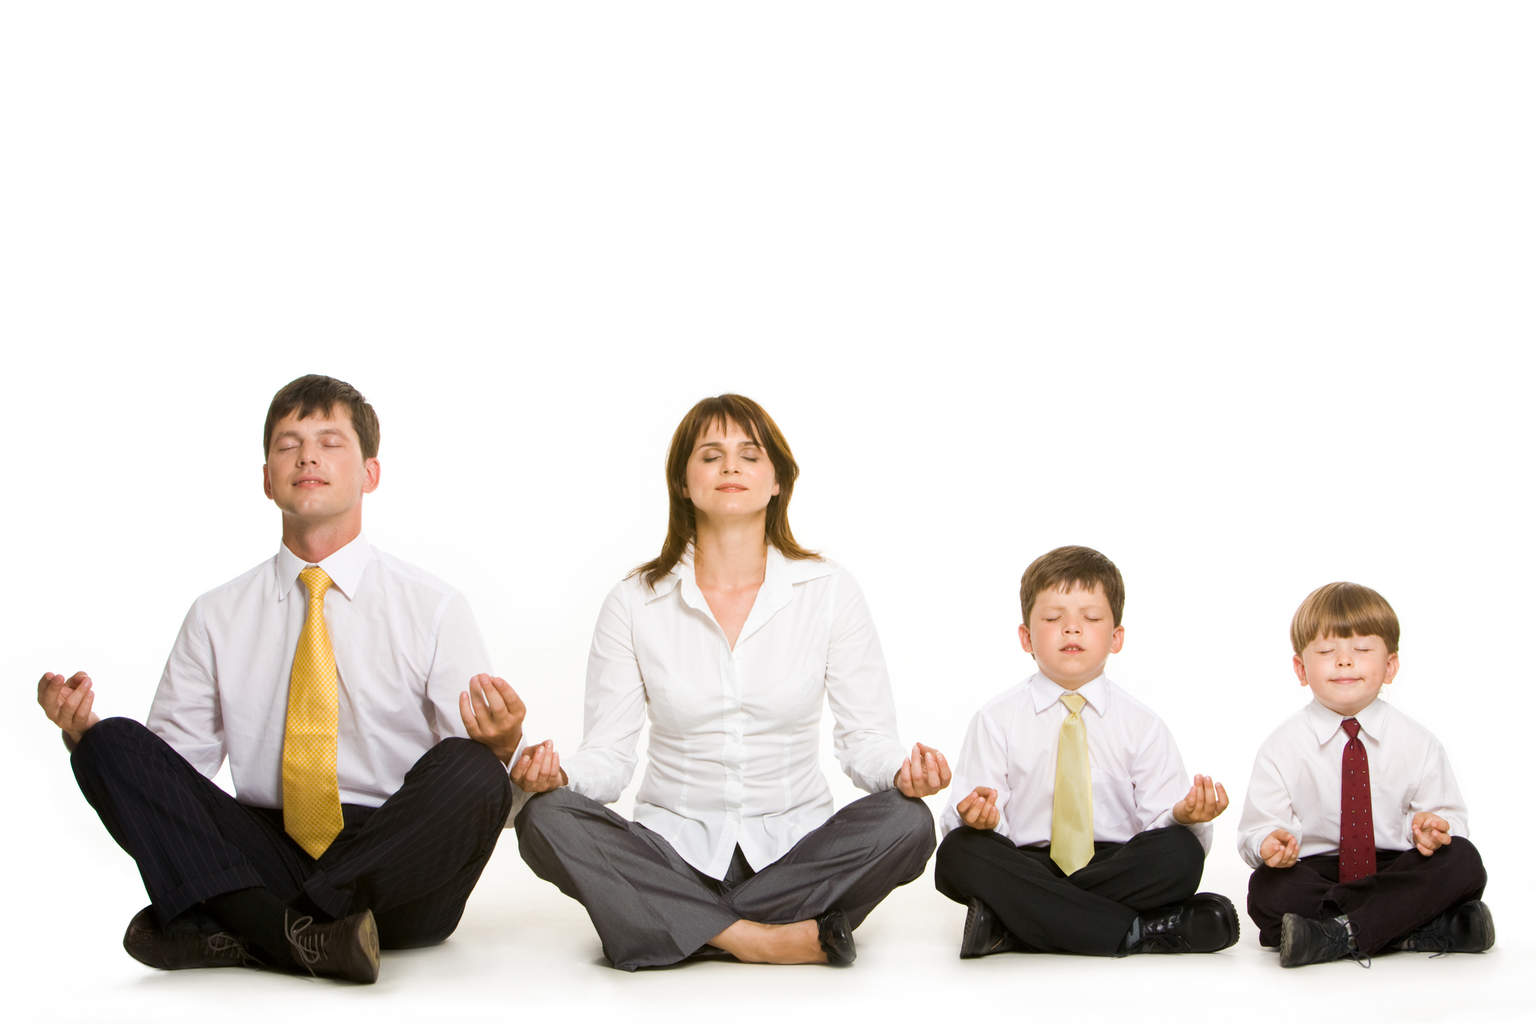 Dreamstime 88491751 Despre Meditatie Si Importanta Ei In Evolutia Personala A Individului